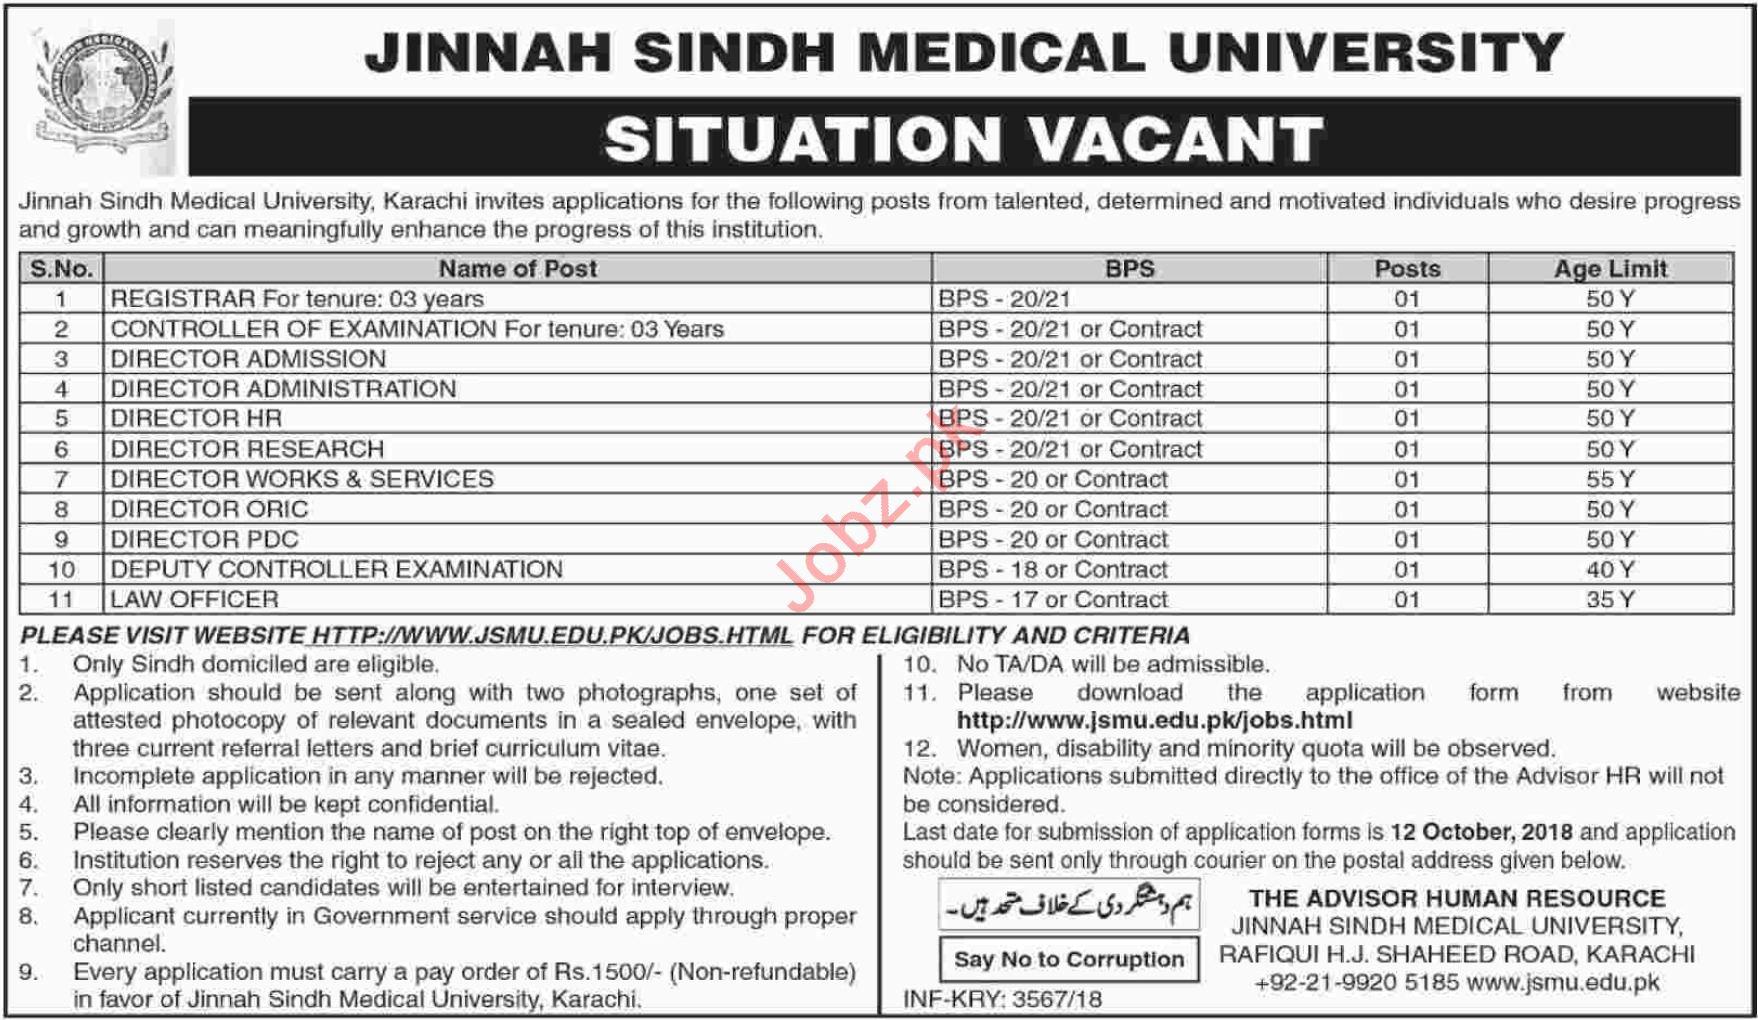 Jinnah Sindh Medical University JSMU Karachi Jobs 2018